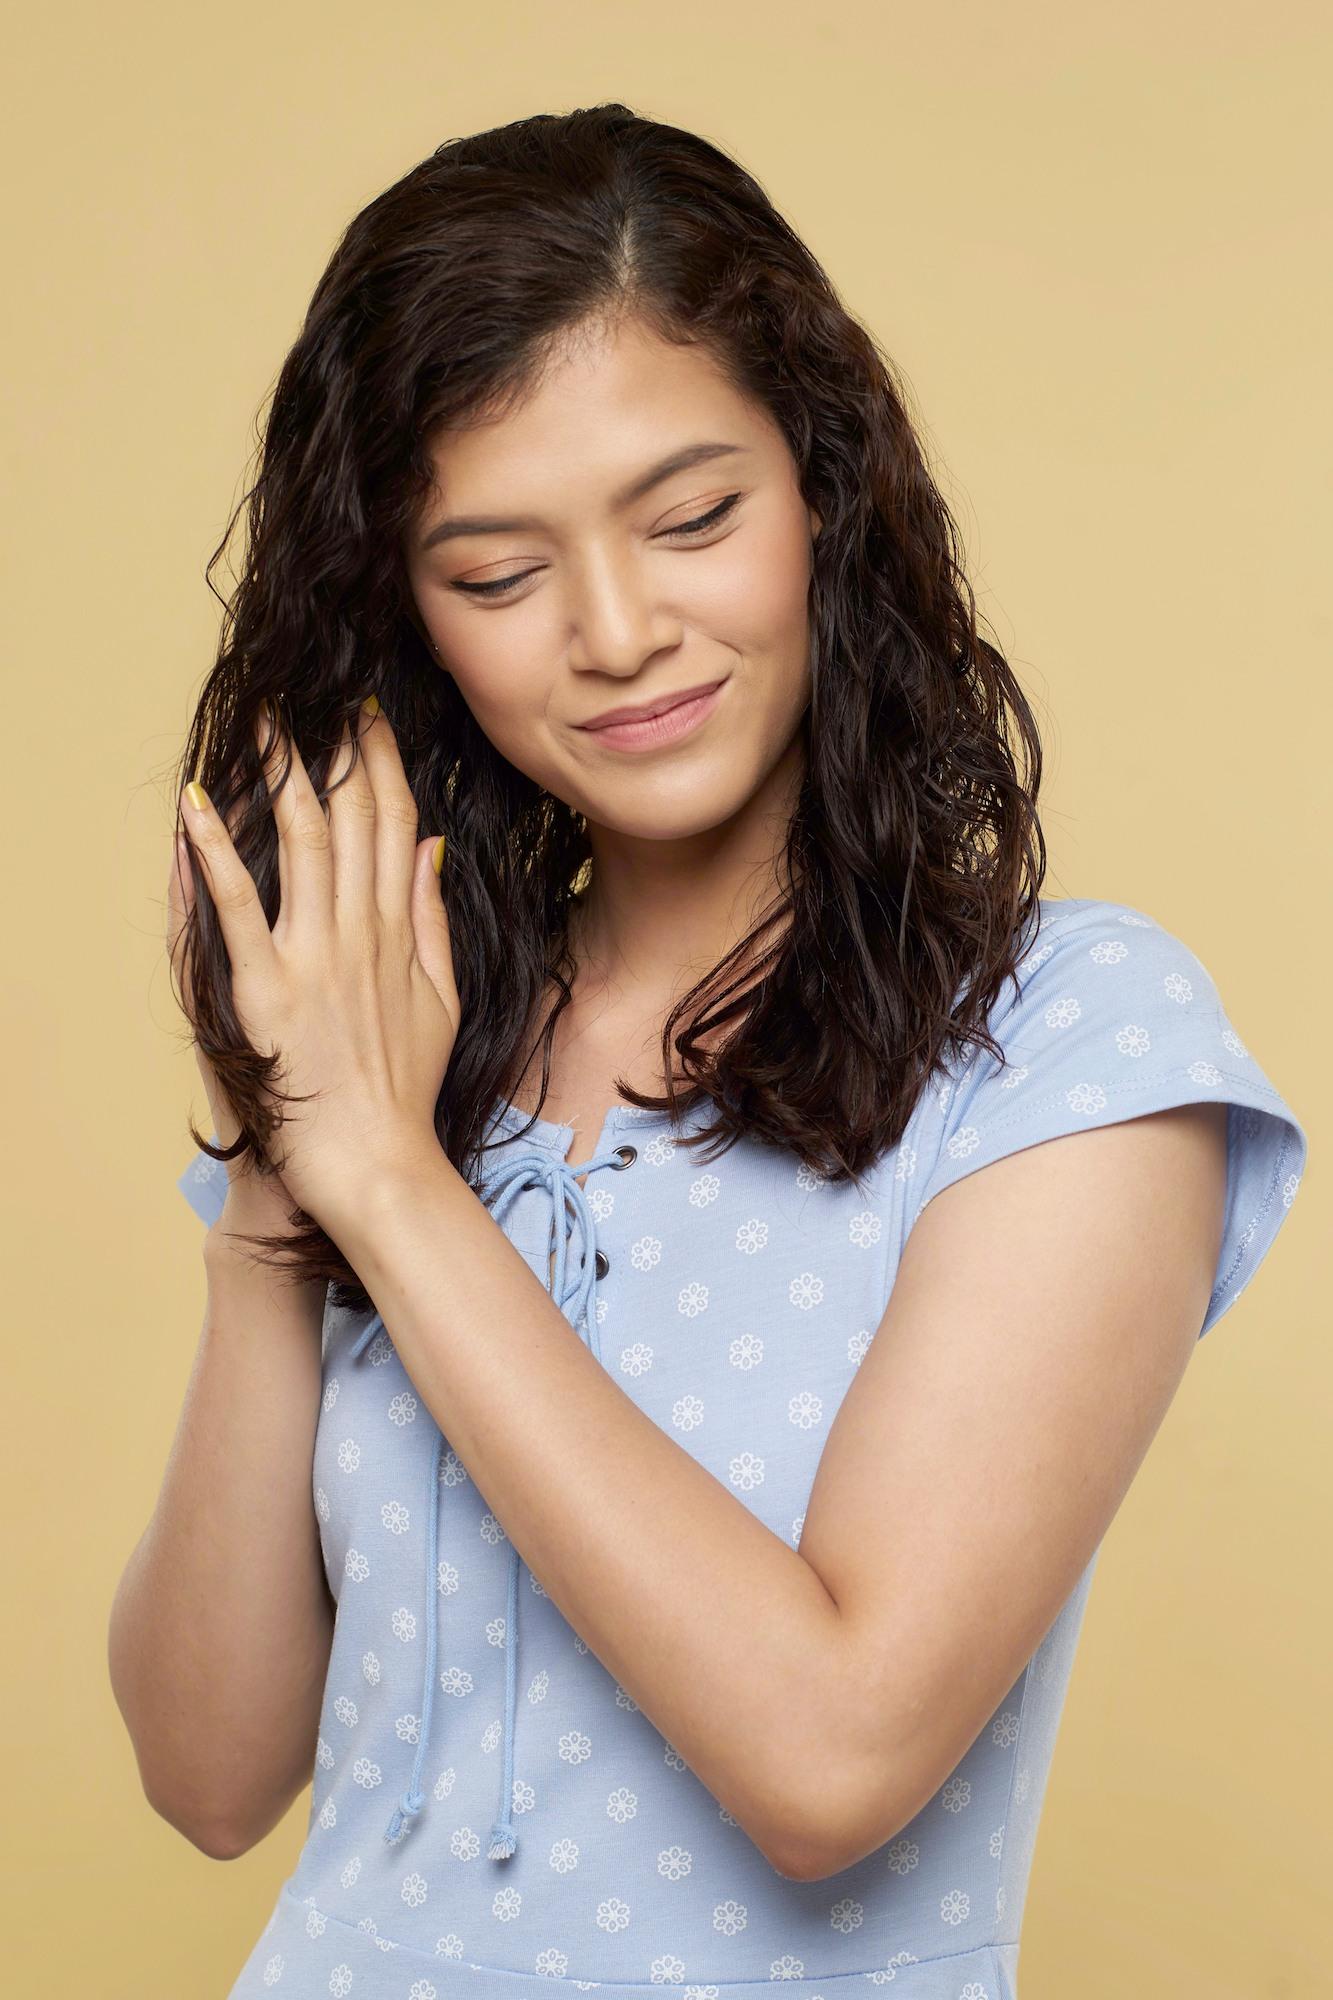 Wanita asia memegang rambut basahnya, model rambut pendek keriting - Cara menghilangkan ketombe secara alami